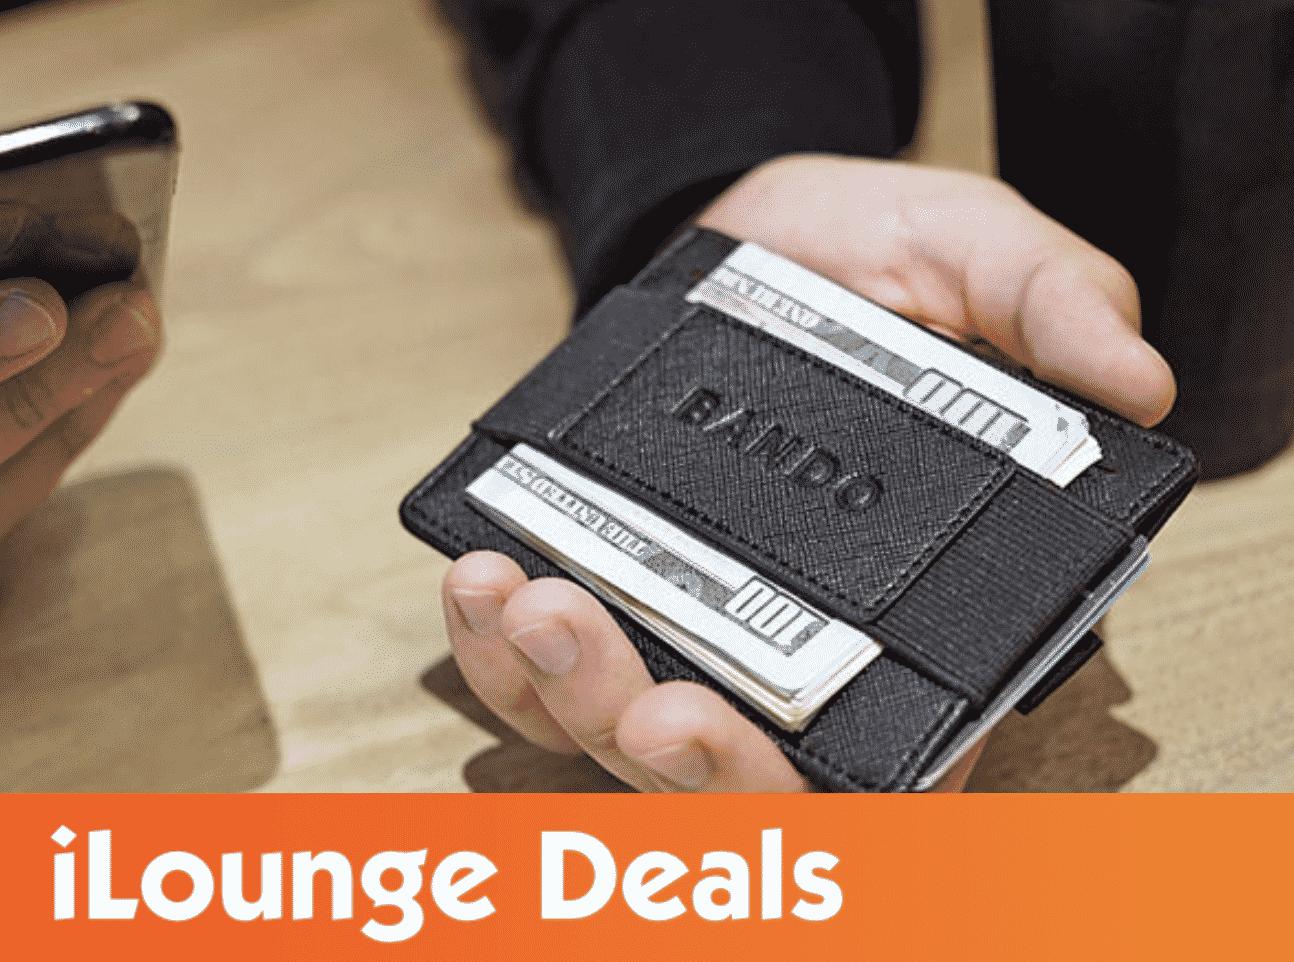 BANDO 2.0 Multi-Functional Slim Wallet